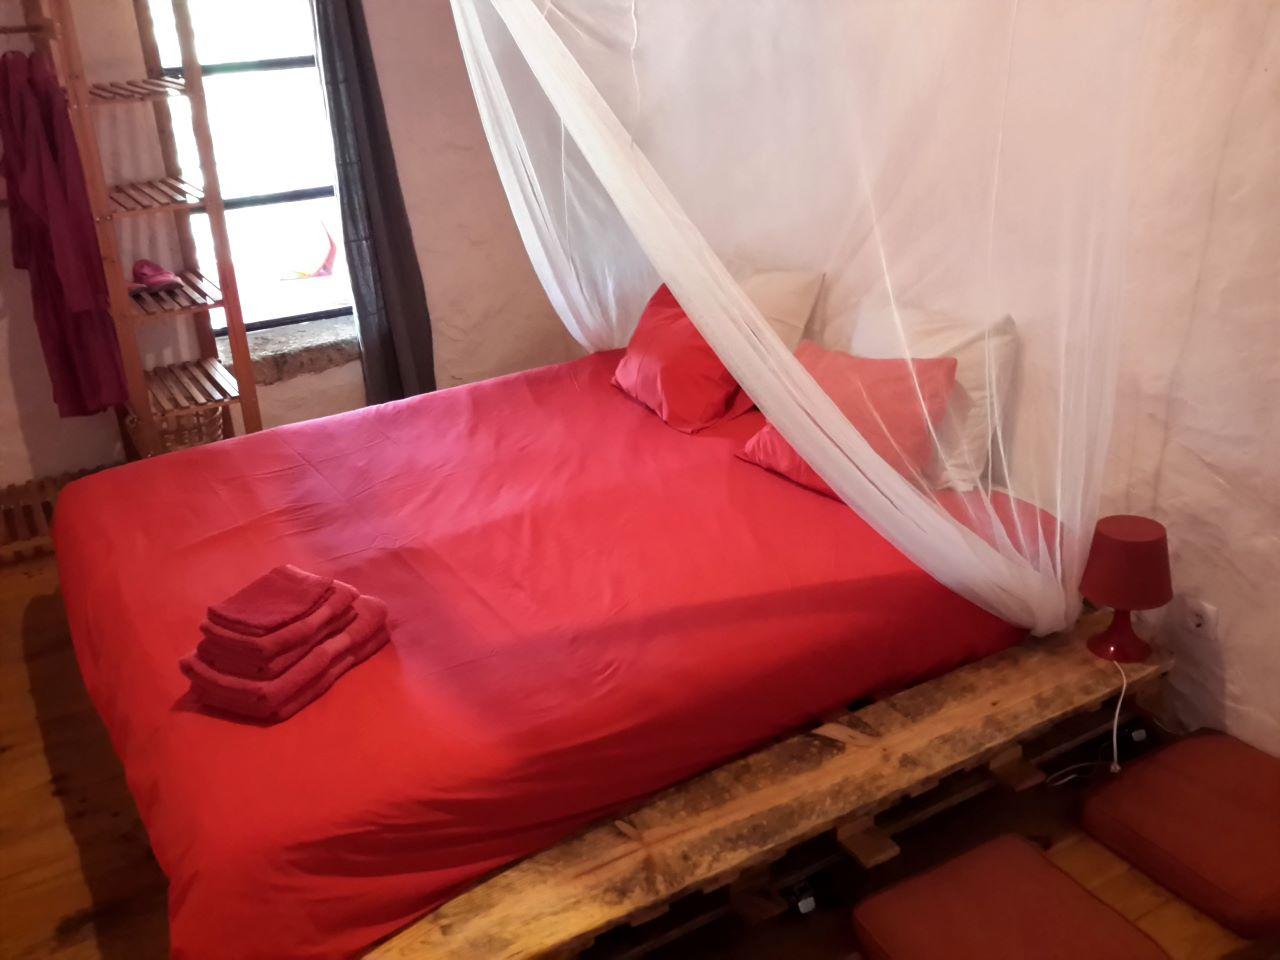 Turismo rural quarto romantico com lareira